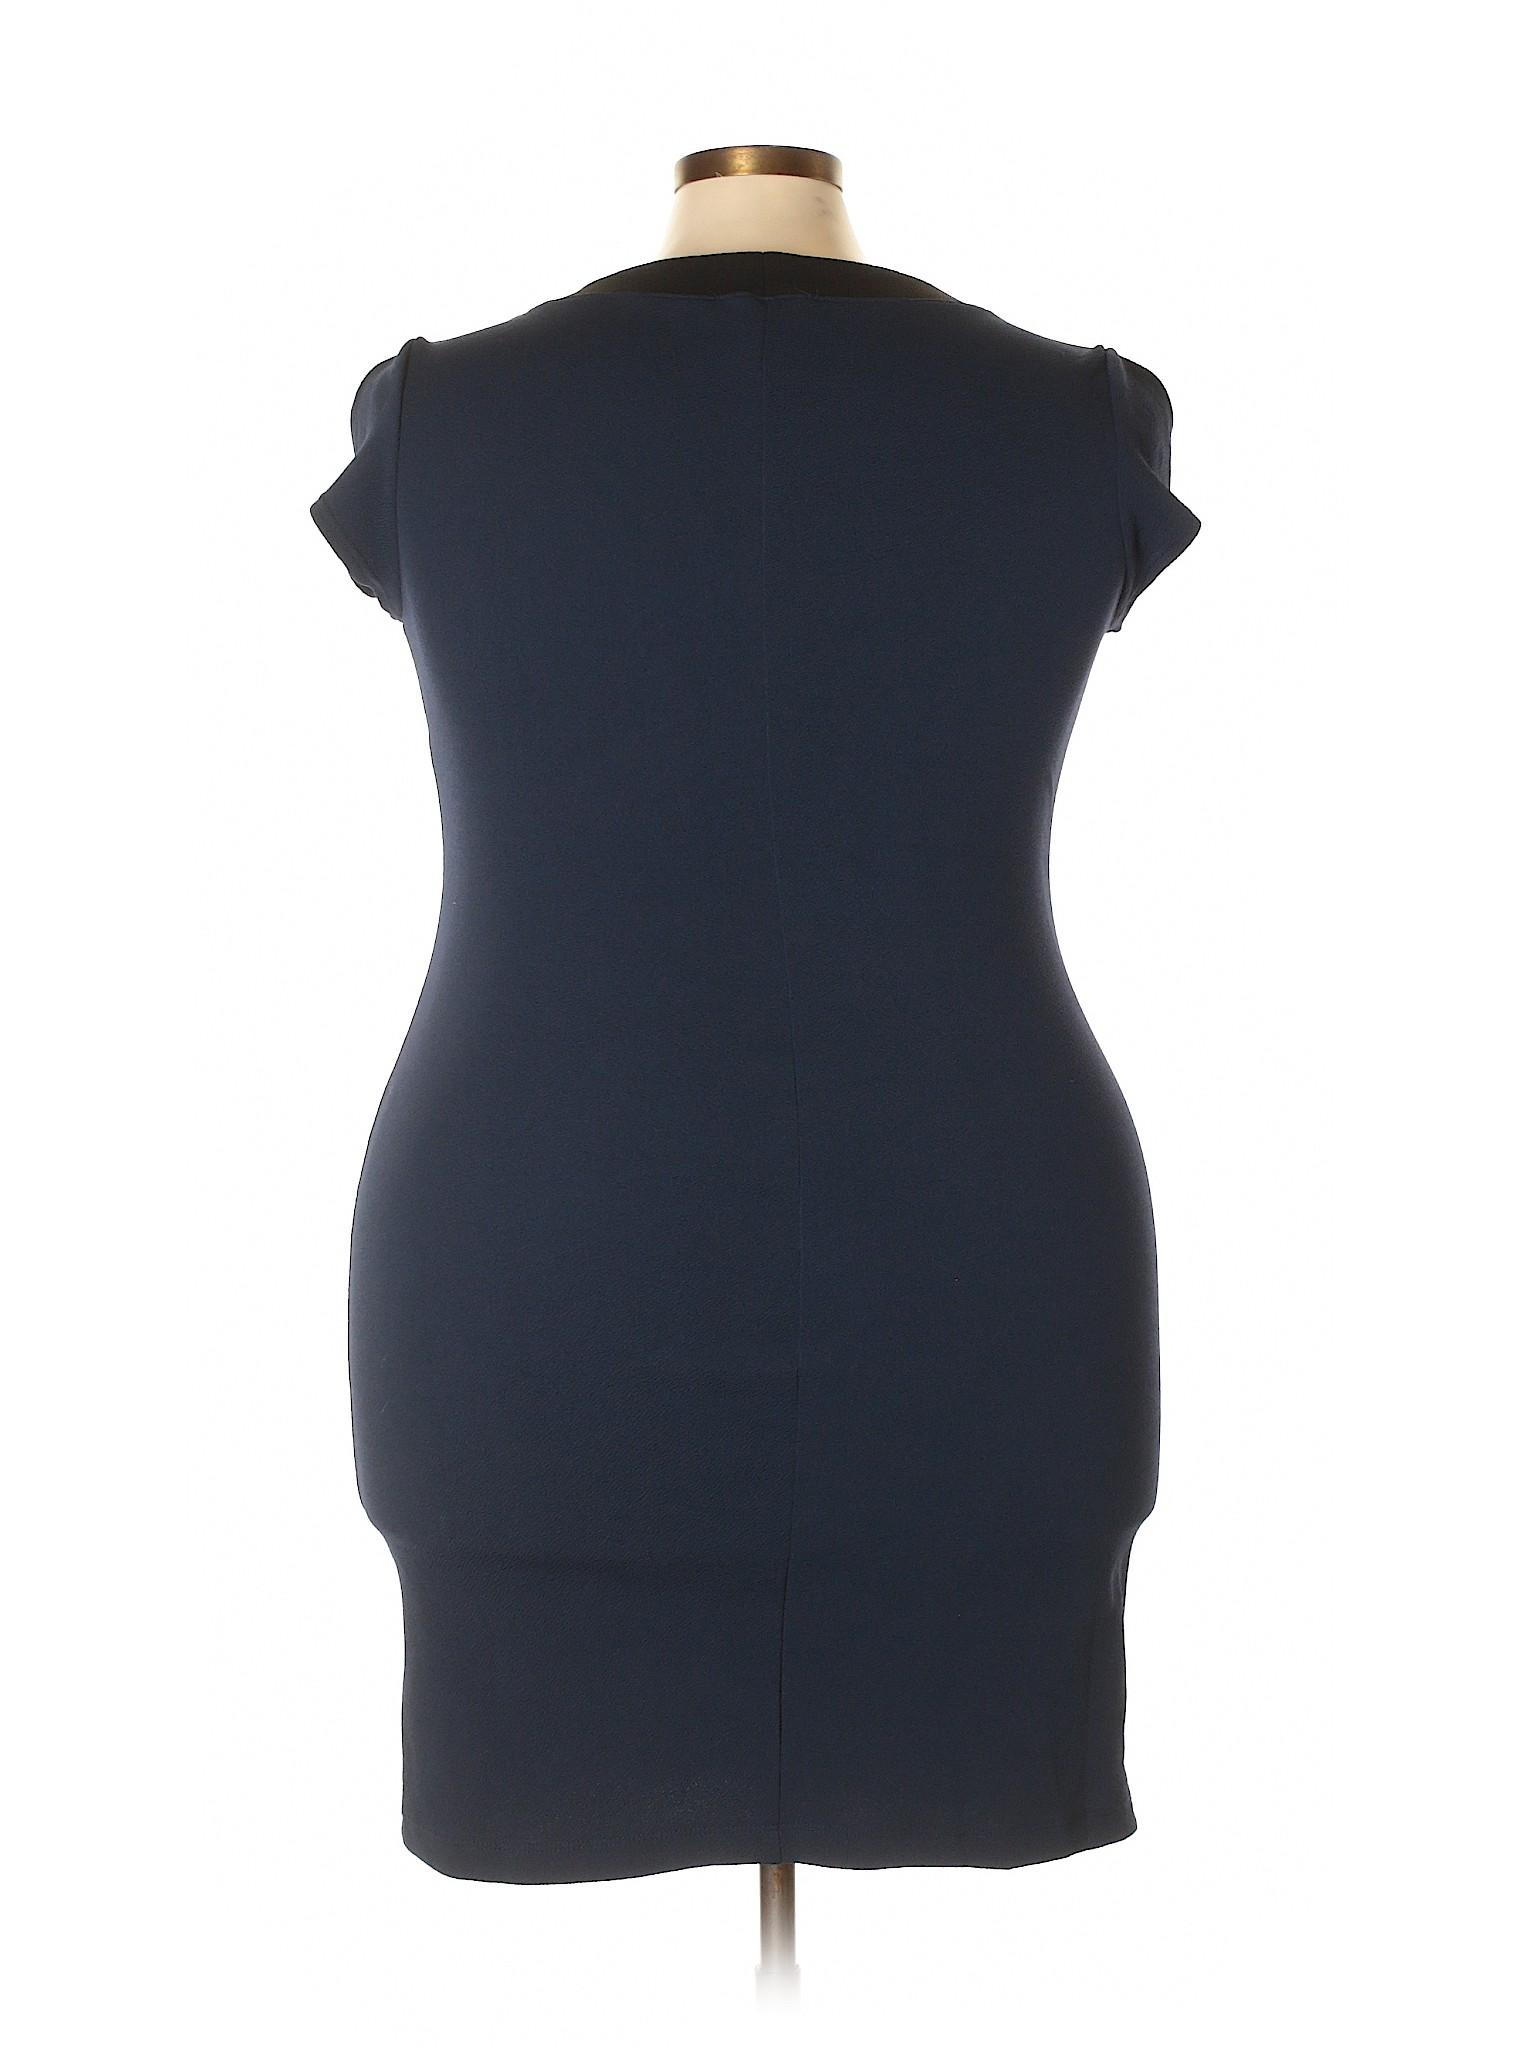 Selling Mystic Mystic Casual Dress Selling Casual Dress 1Pr1q